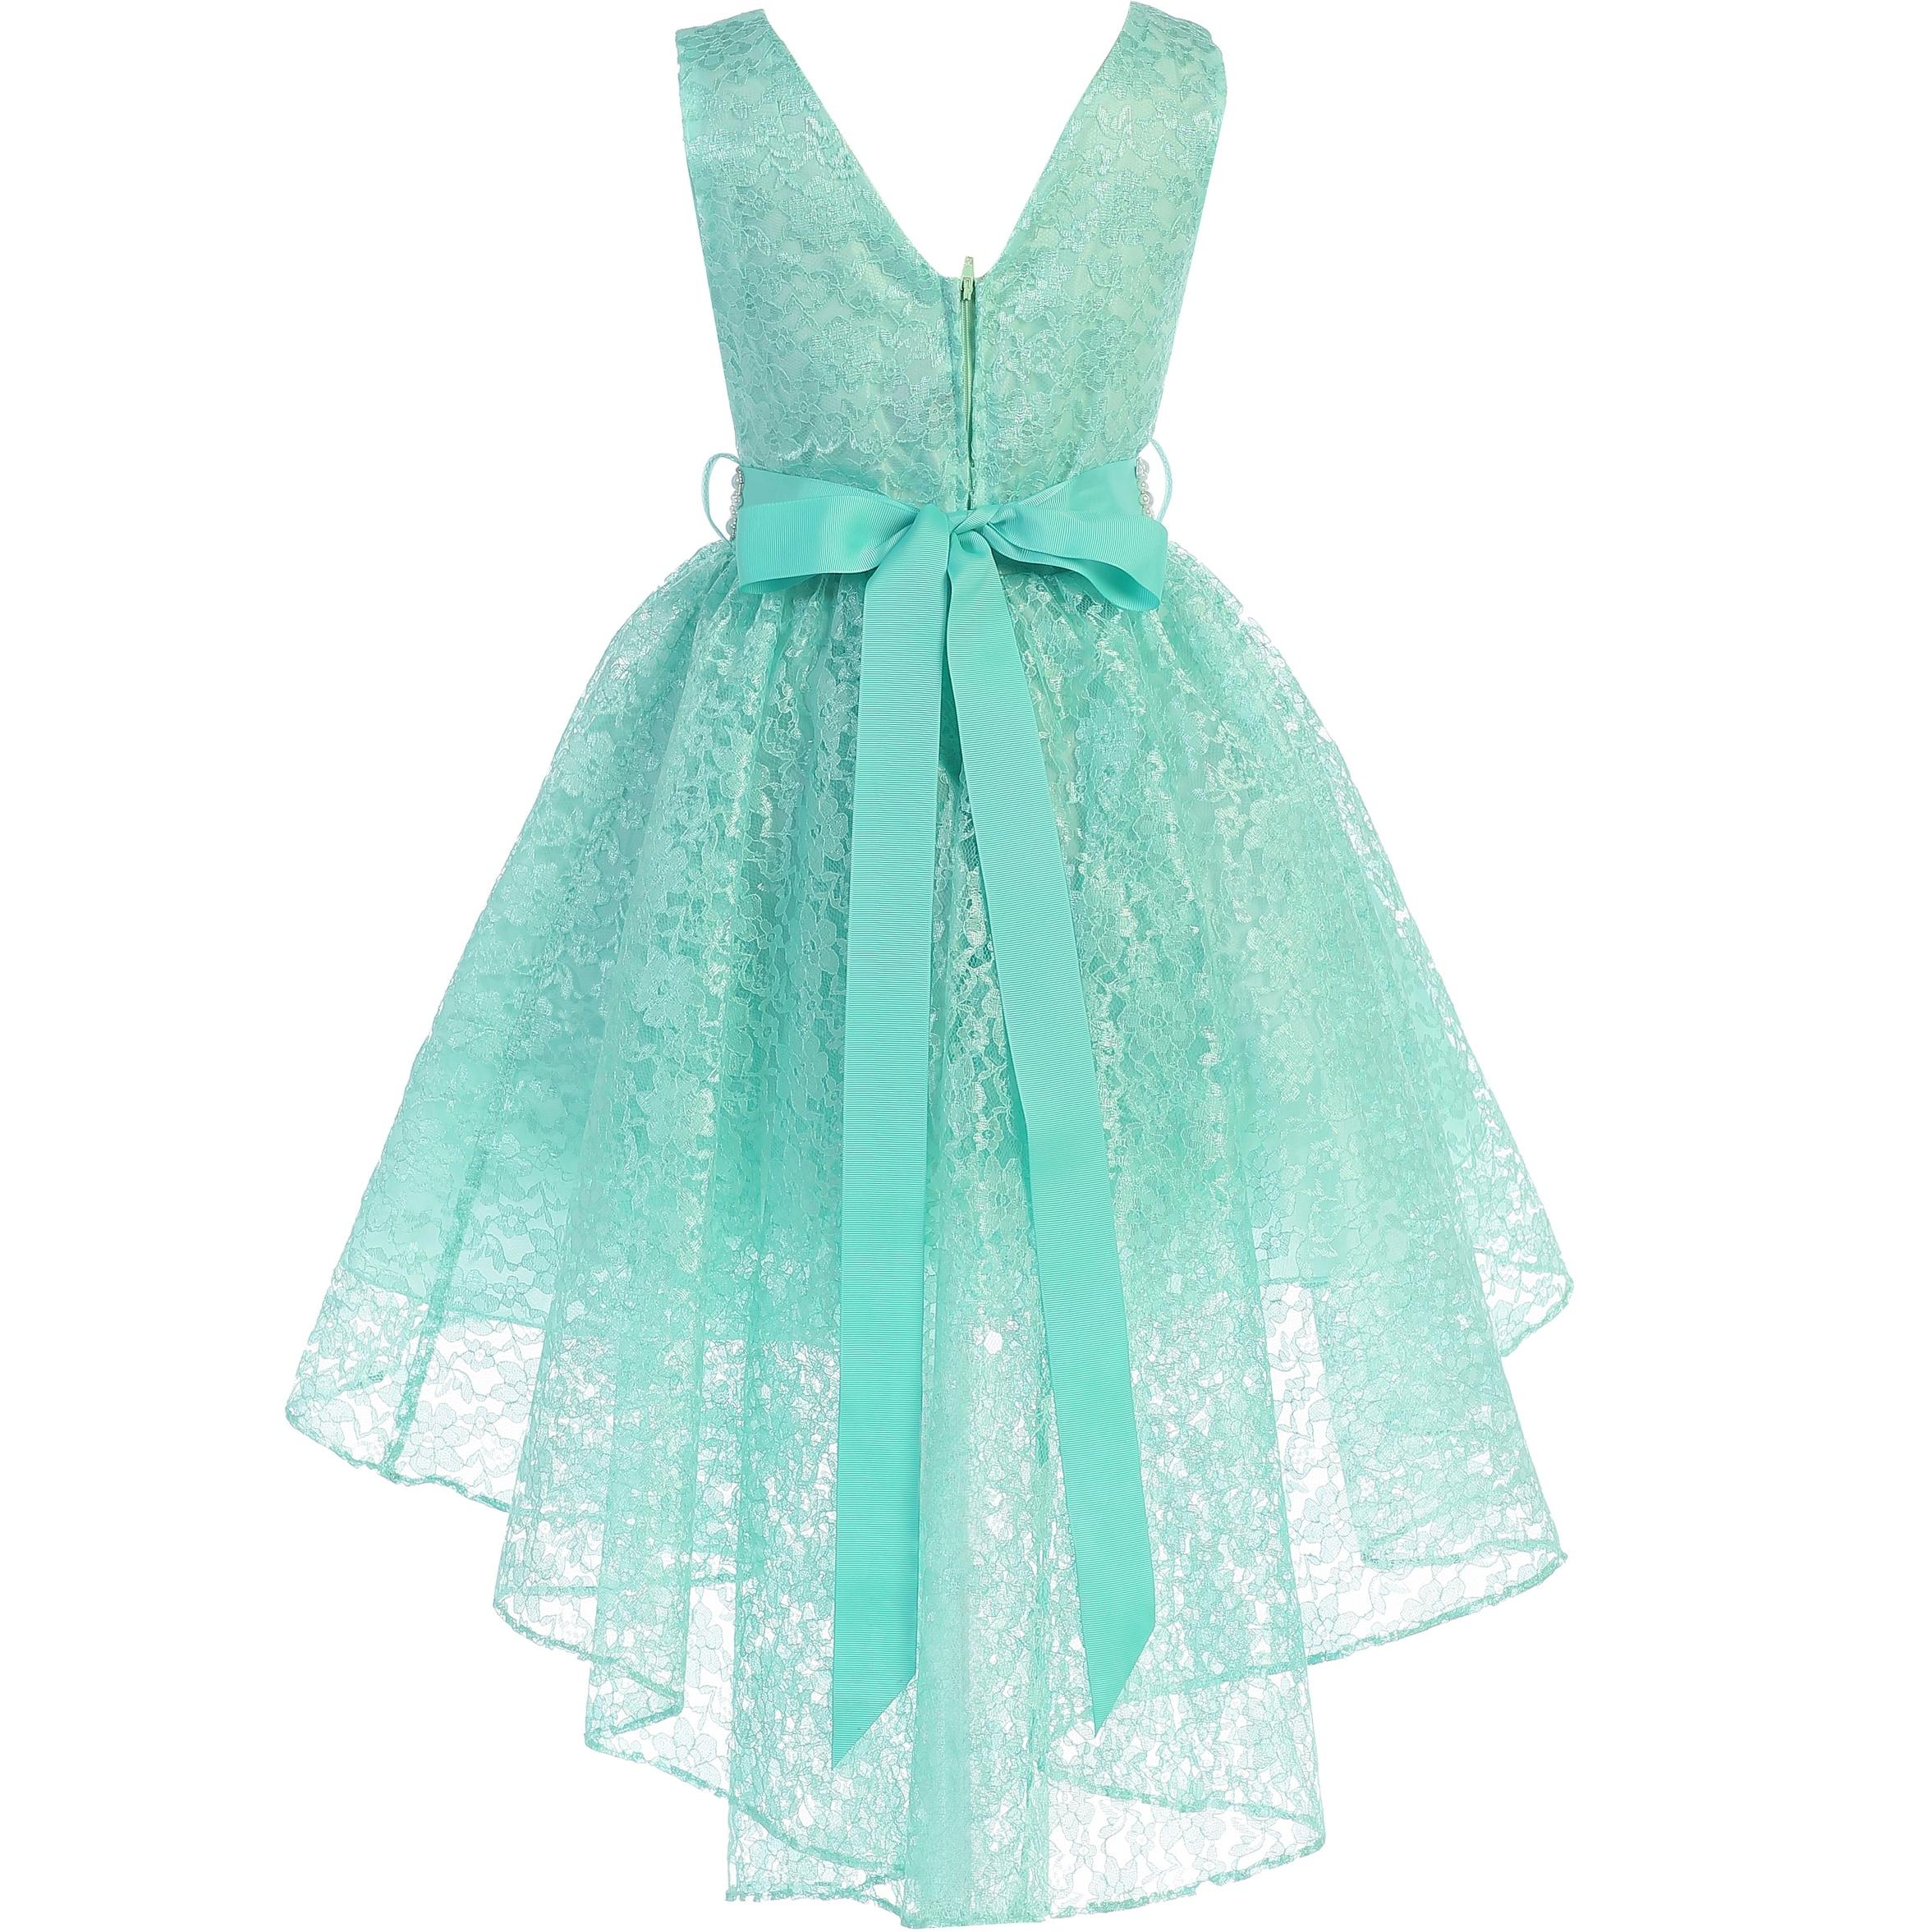 Toddler Kid Flower Girl Dress High Low Princess Birthday Baptism Christening